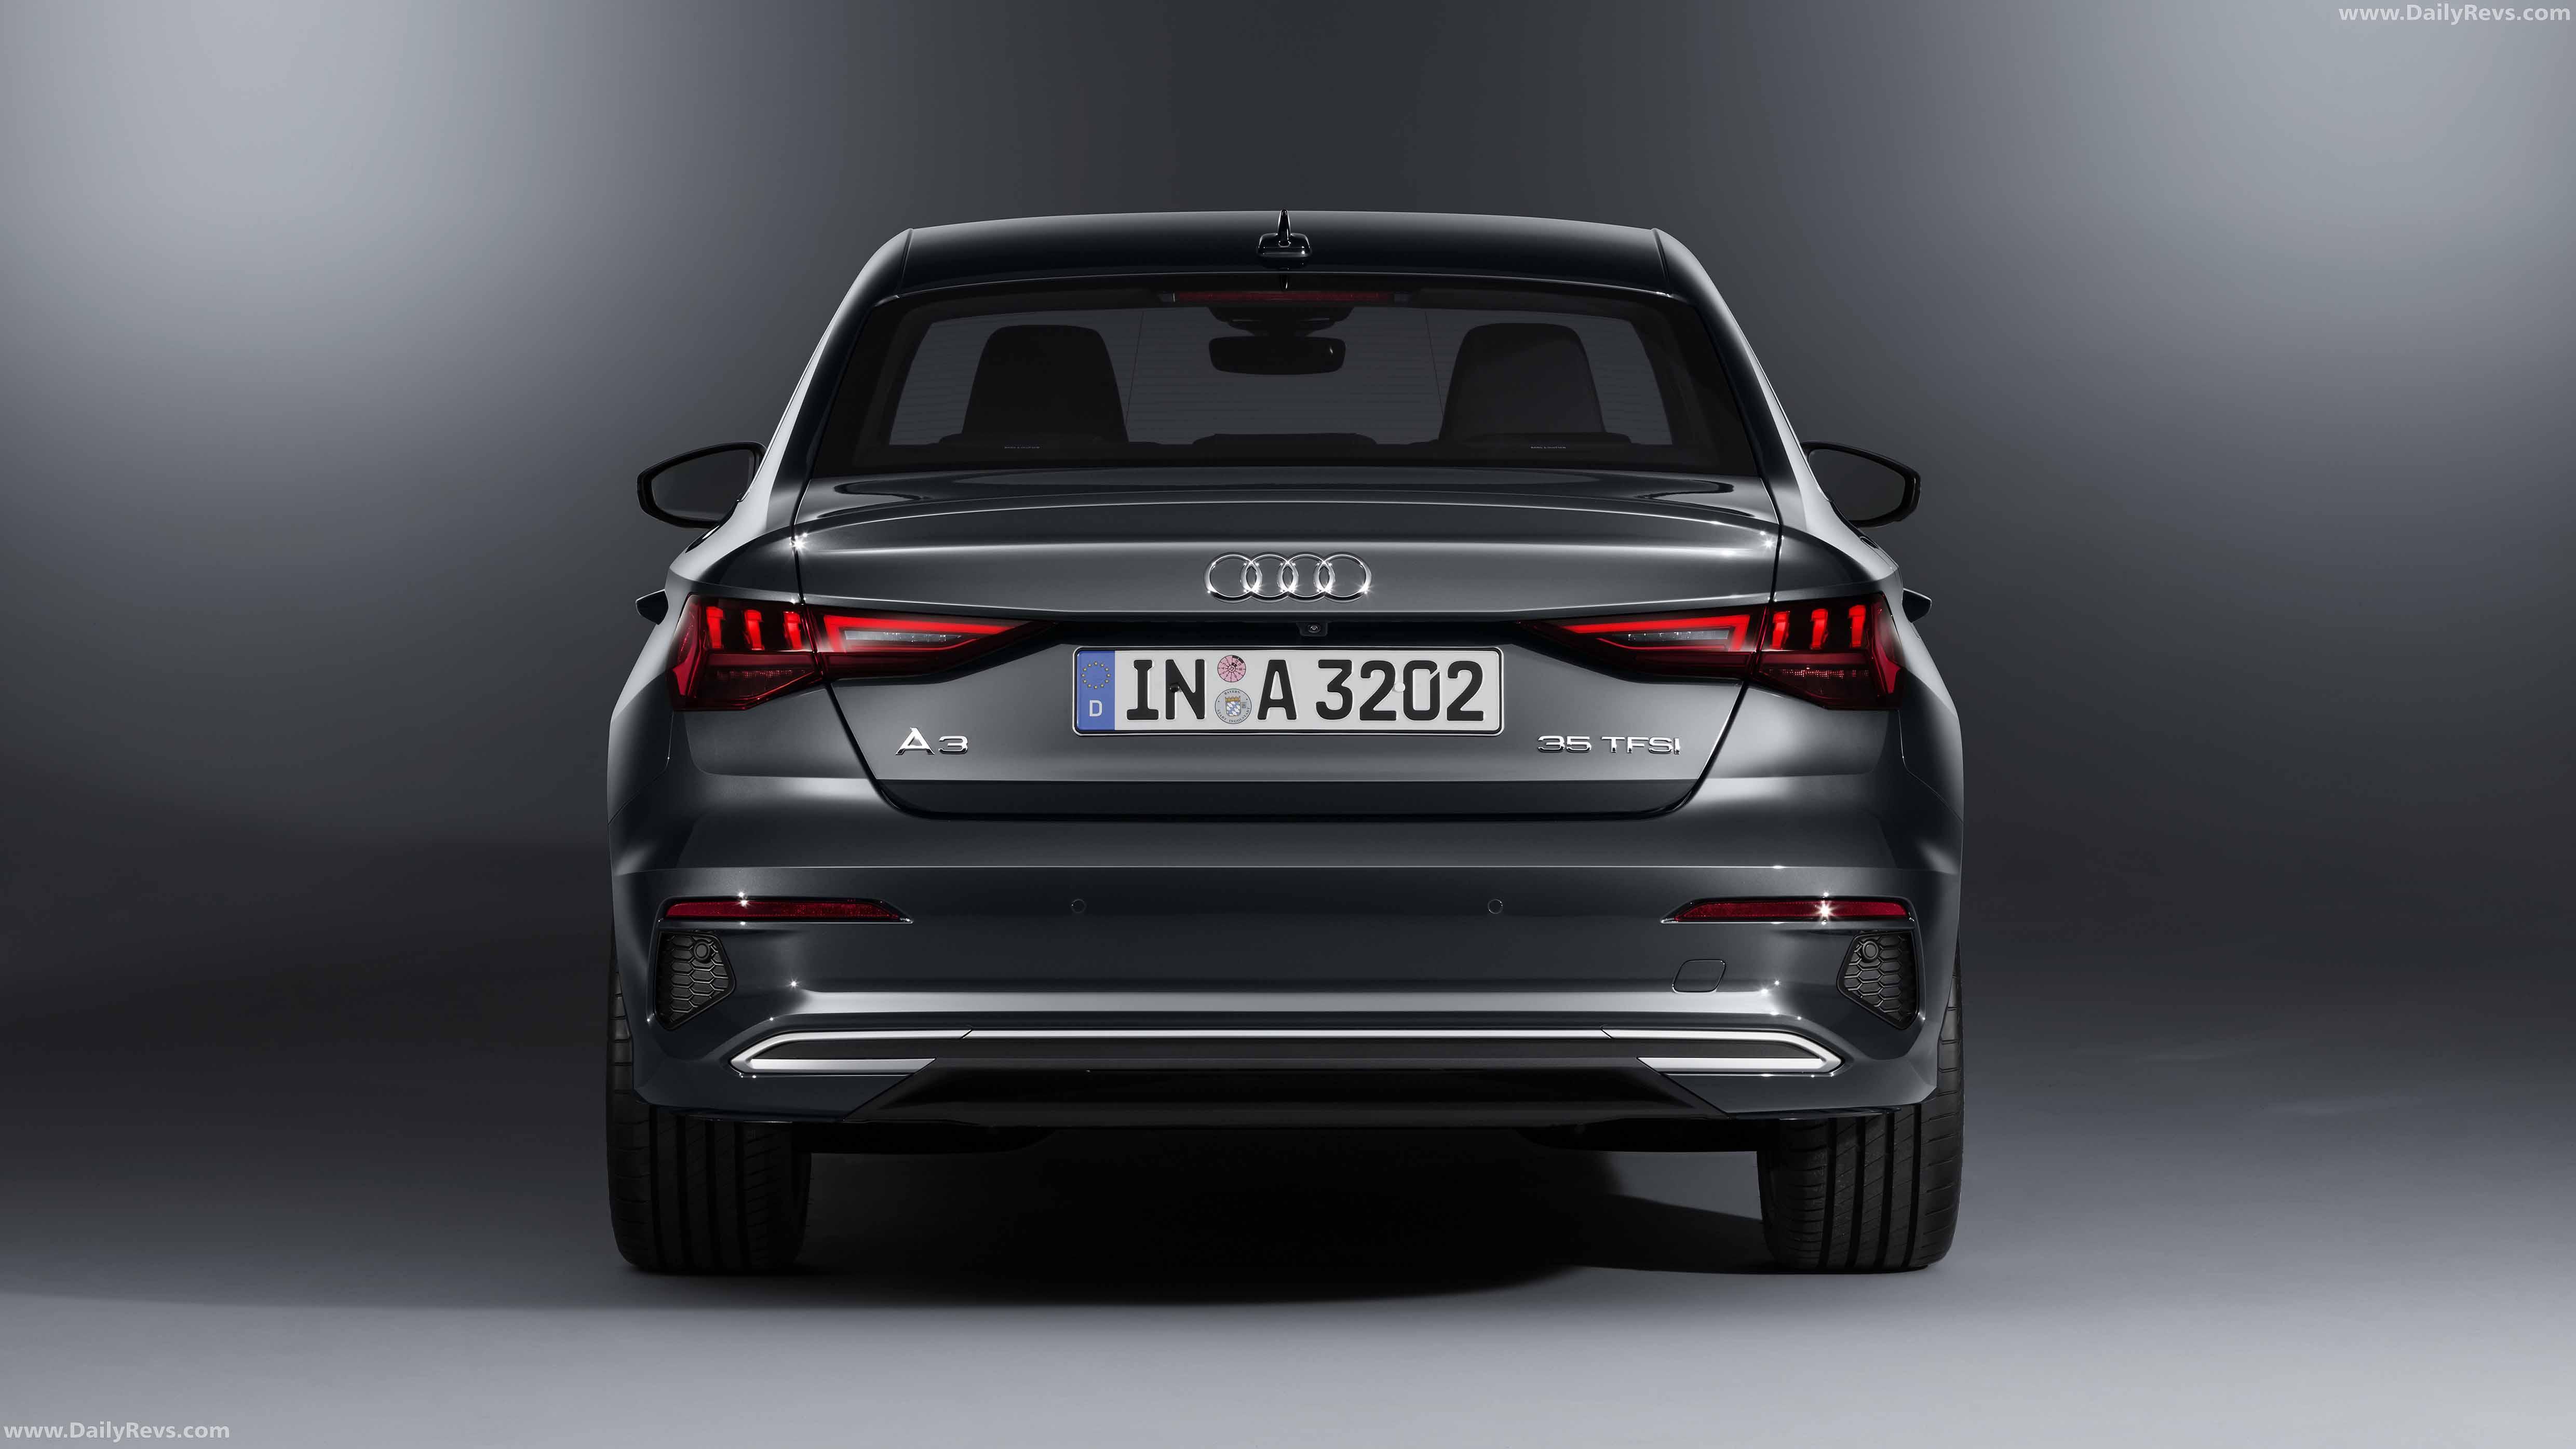 2021 Audi A3 Sedan - HD Pictures, Videos, Specs ...